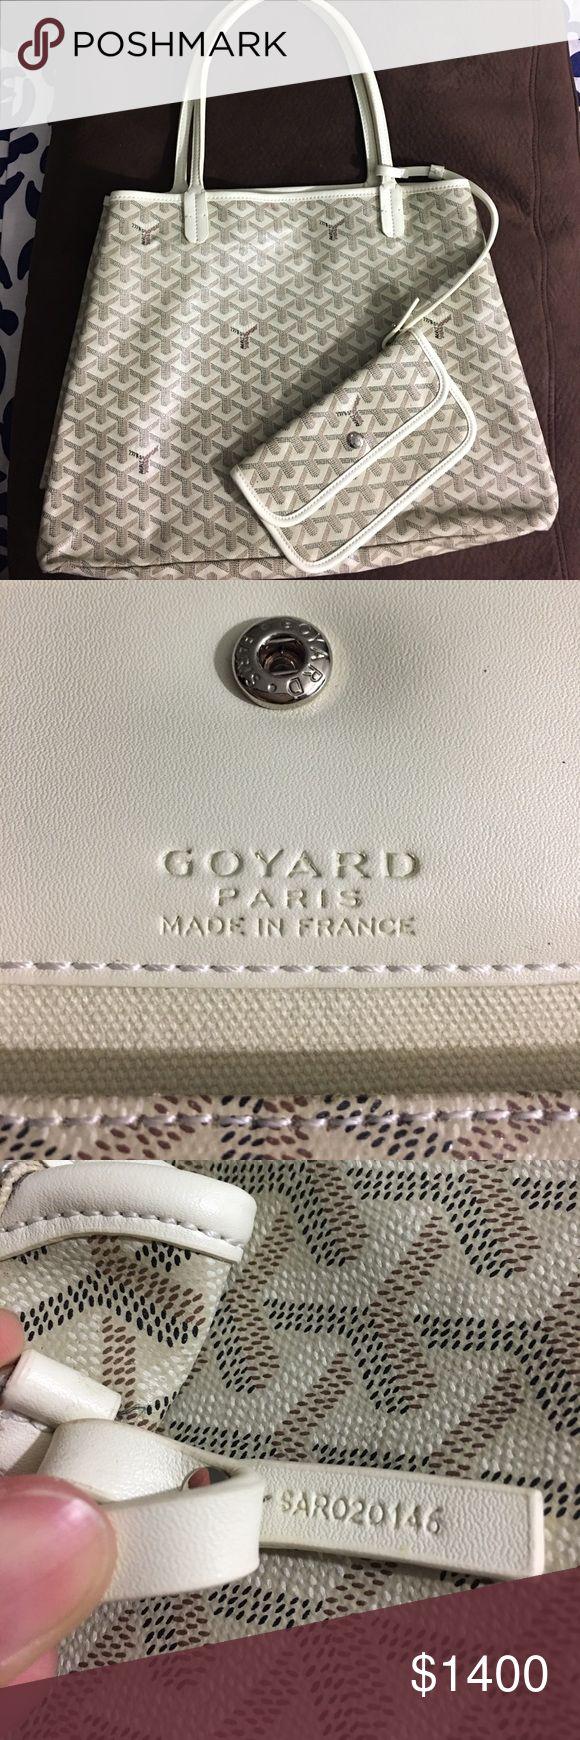 Goyard Tote Slightly use authentic Goyard Tote bag GM. No flaws, just a little dirty inside. Goyard Bags